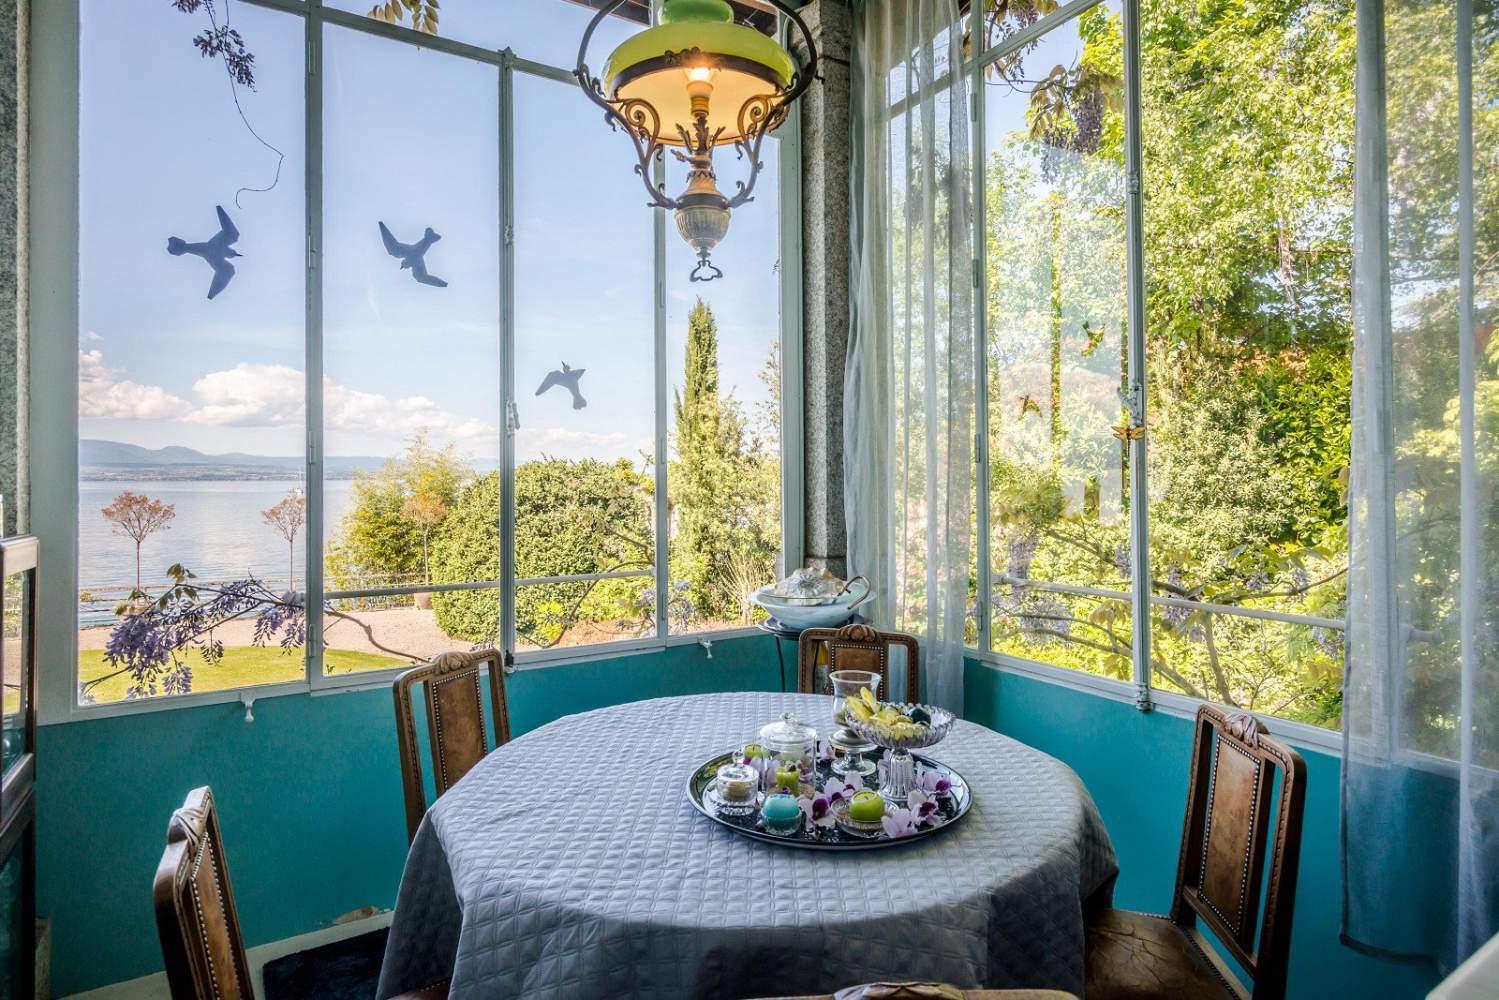 Thonon-les-Bains  - Casa 16 Cuartos 10 Habitaciones - picture 11